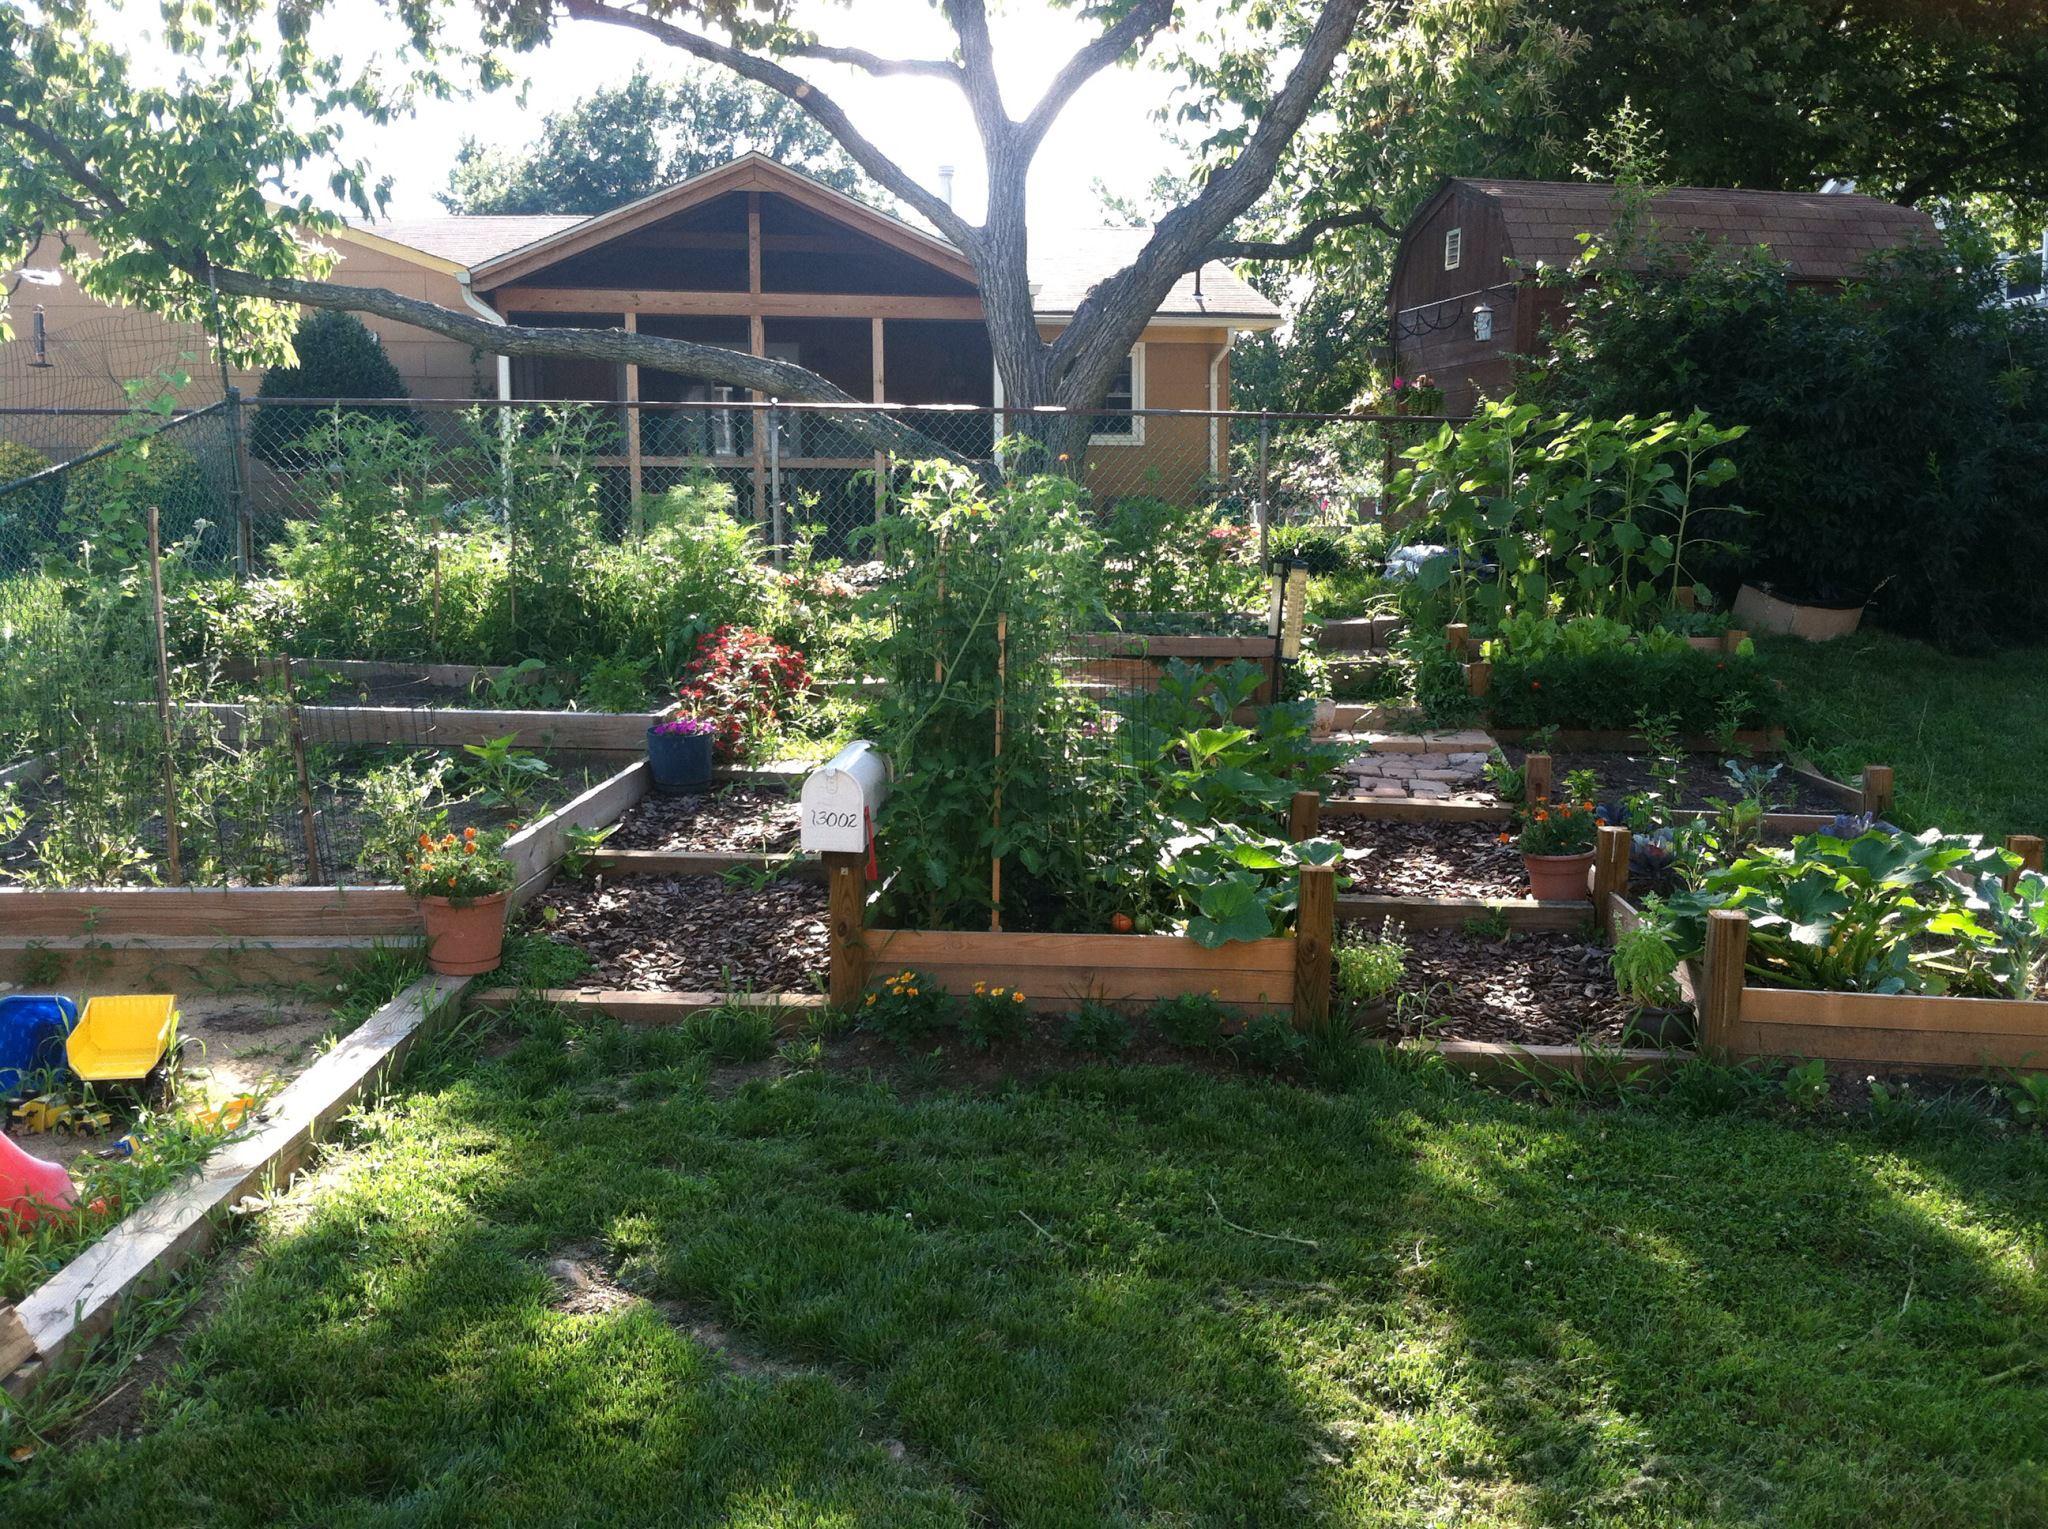 Building a raised garden into a hillside.